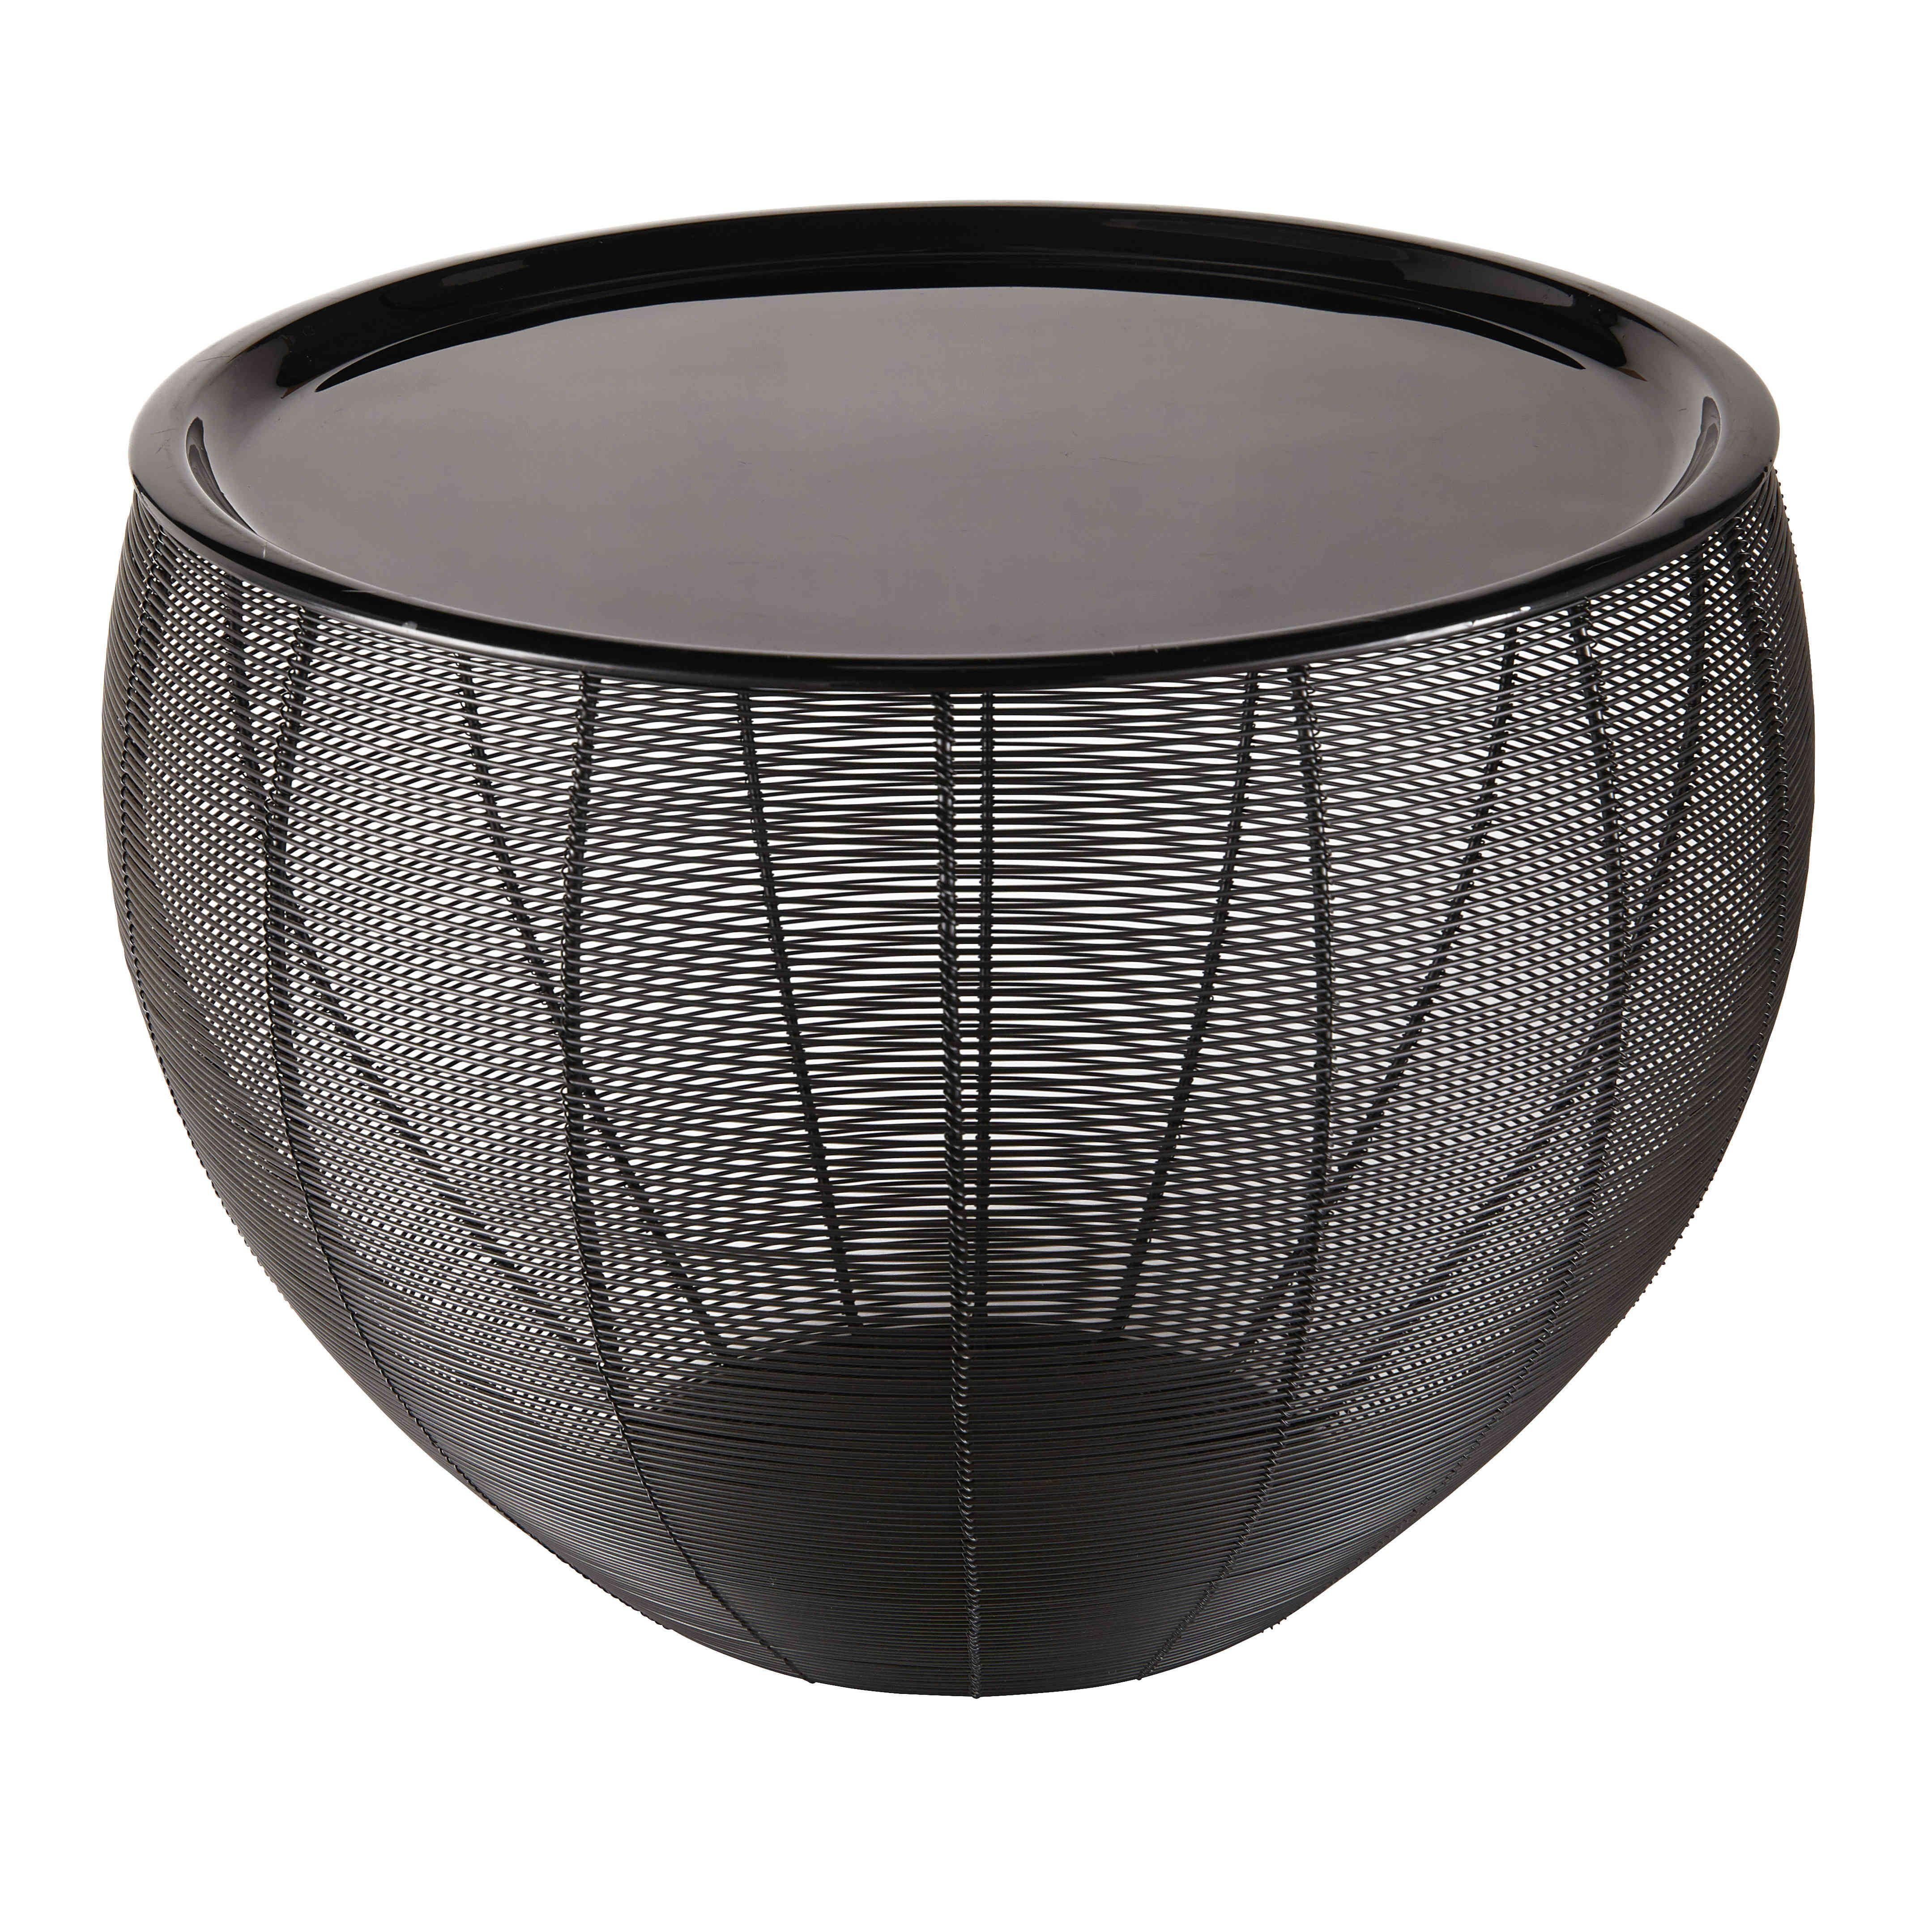 Beste Beistelltisch Garten Ikea Schema Garten Design Ideen